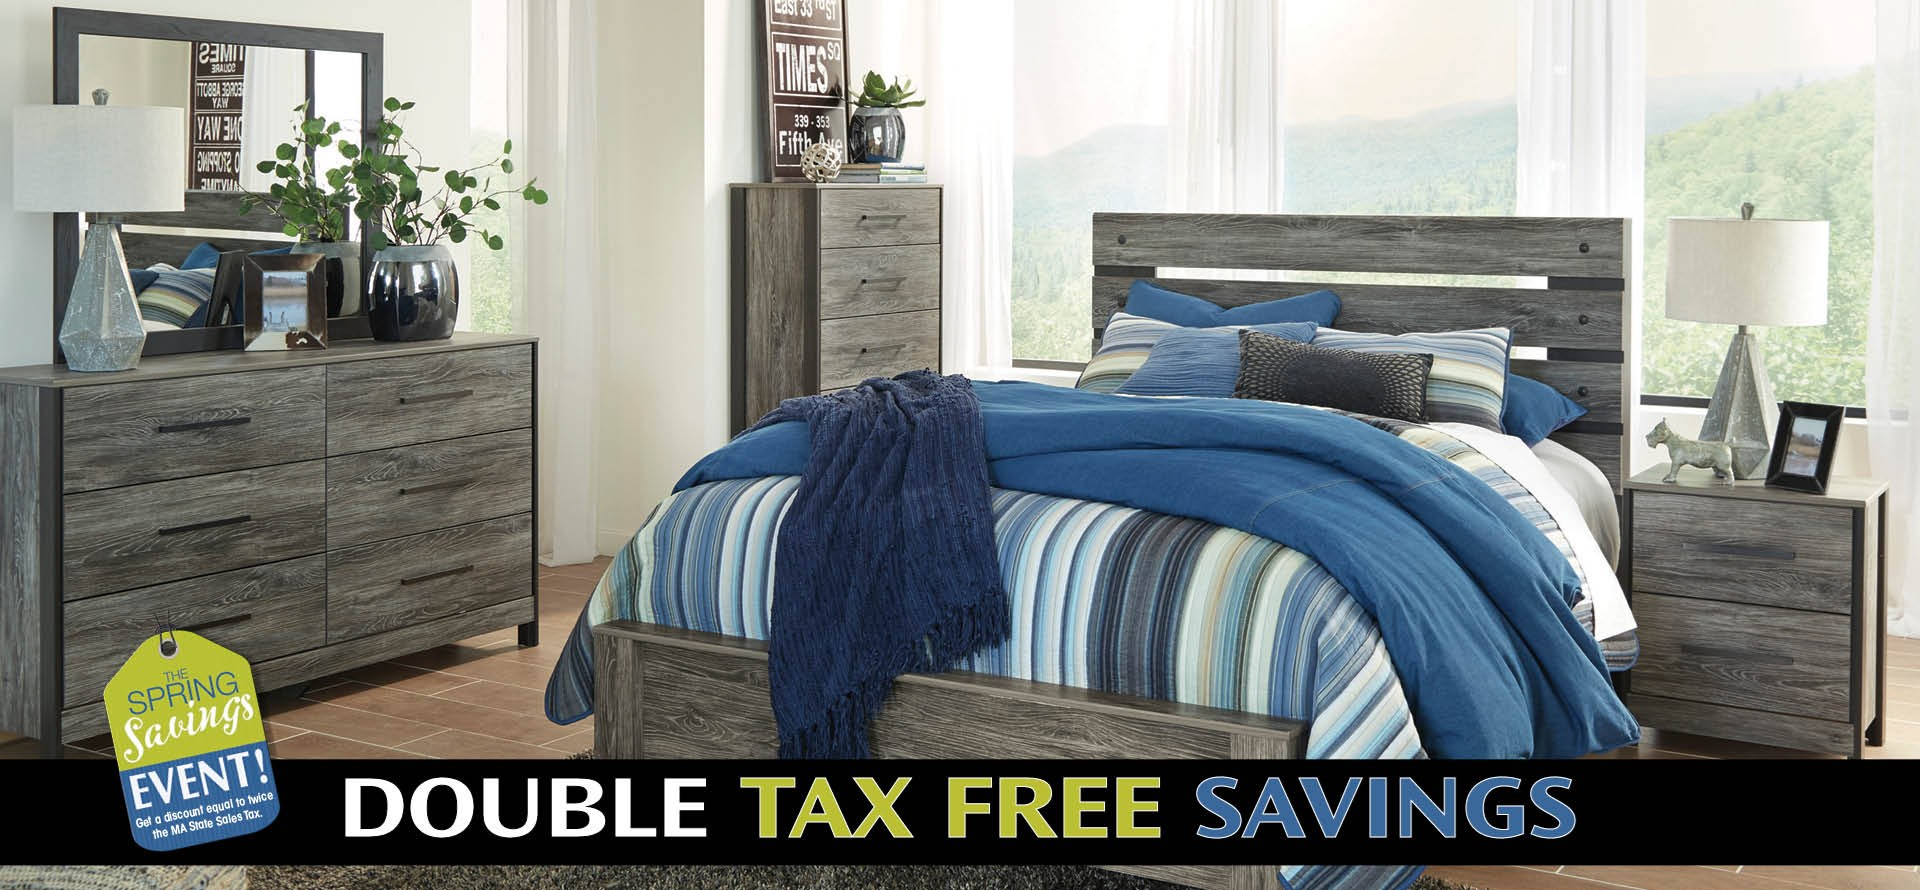 Double Tax Free Savings